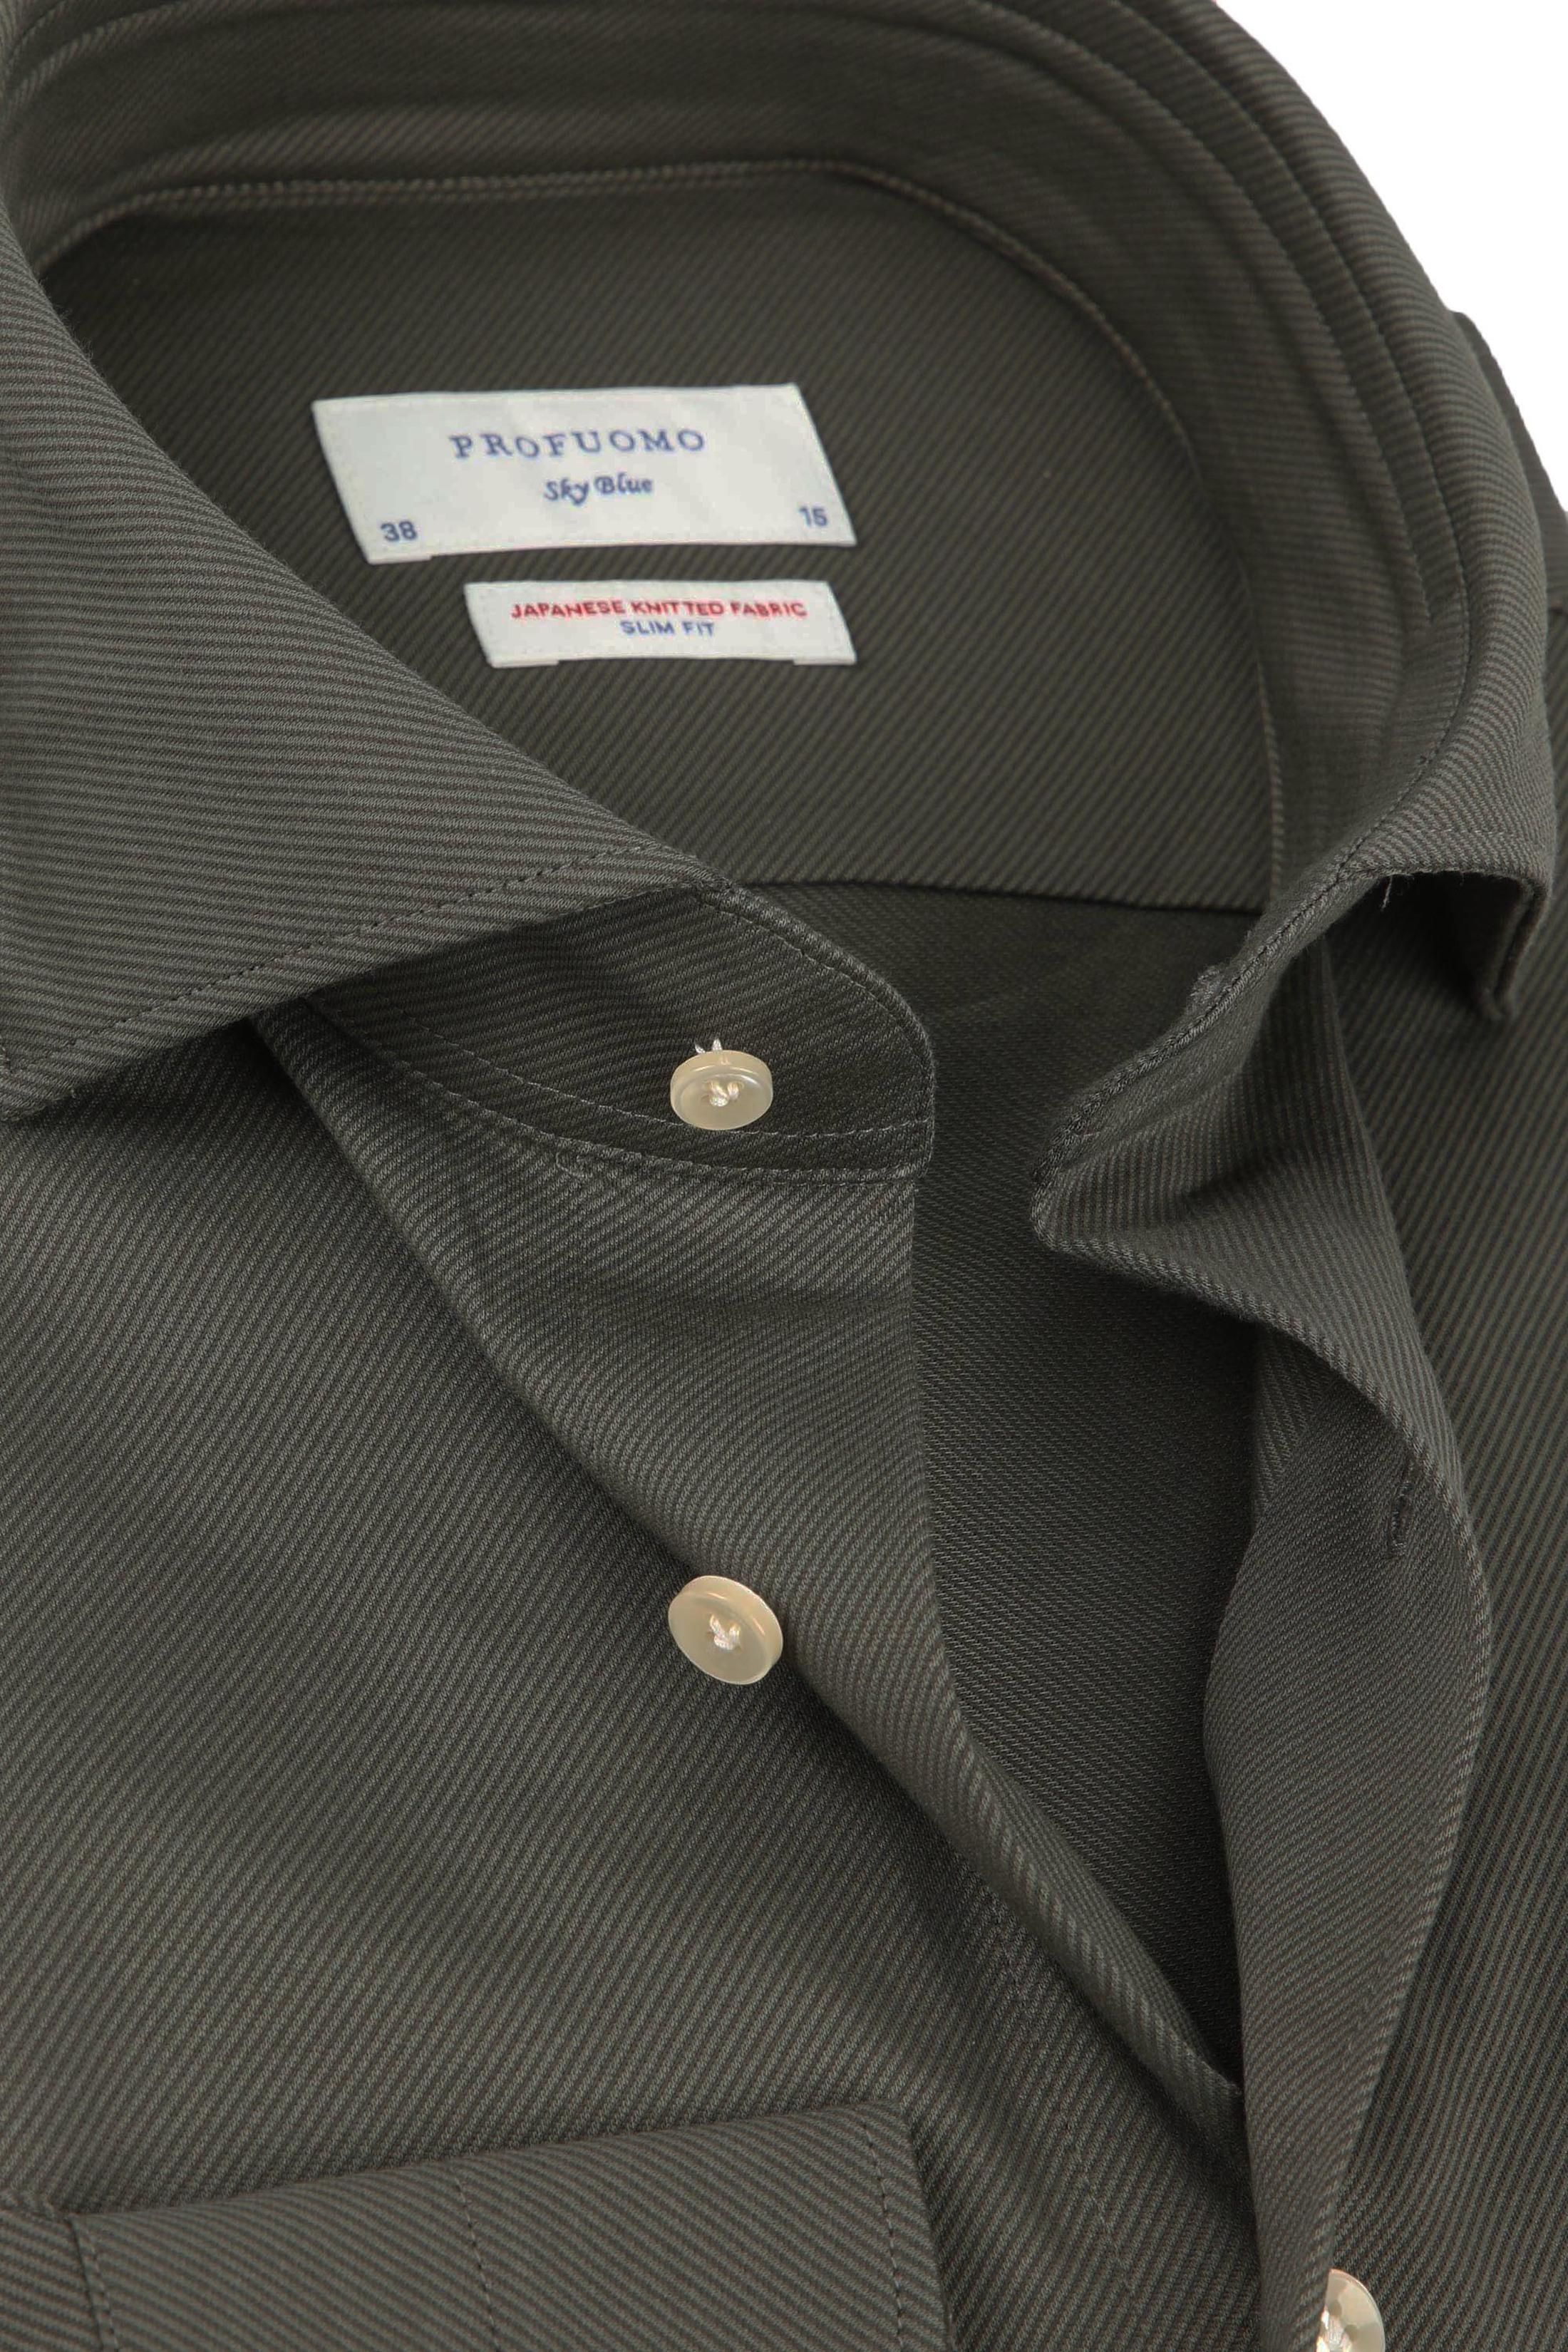 Profuomo Sky Blue SF Overhemd Donkergroen